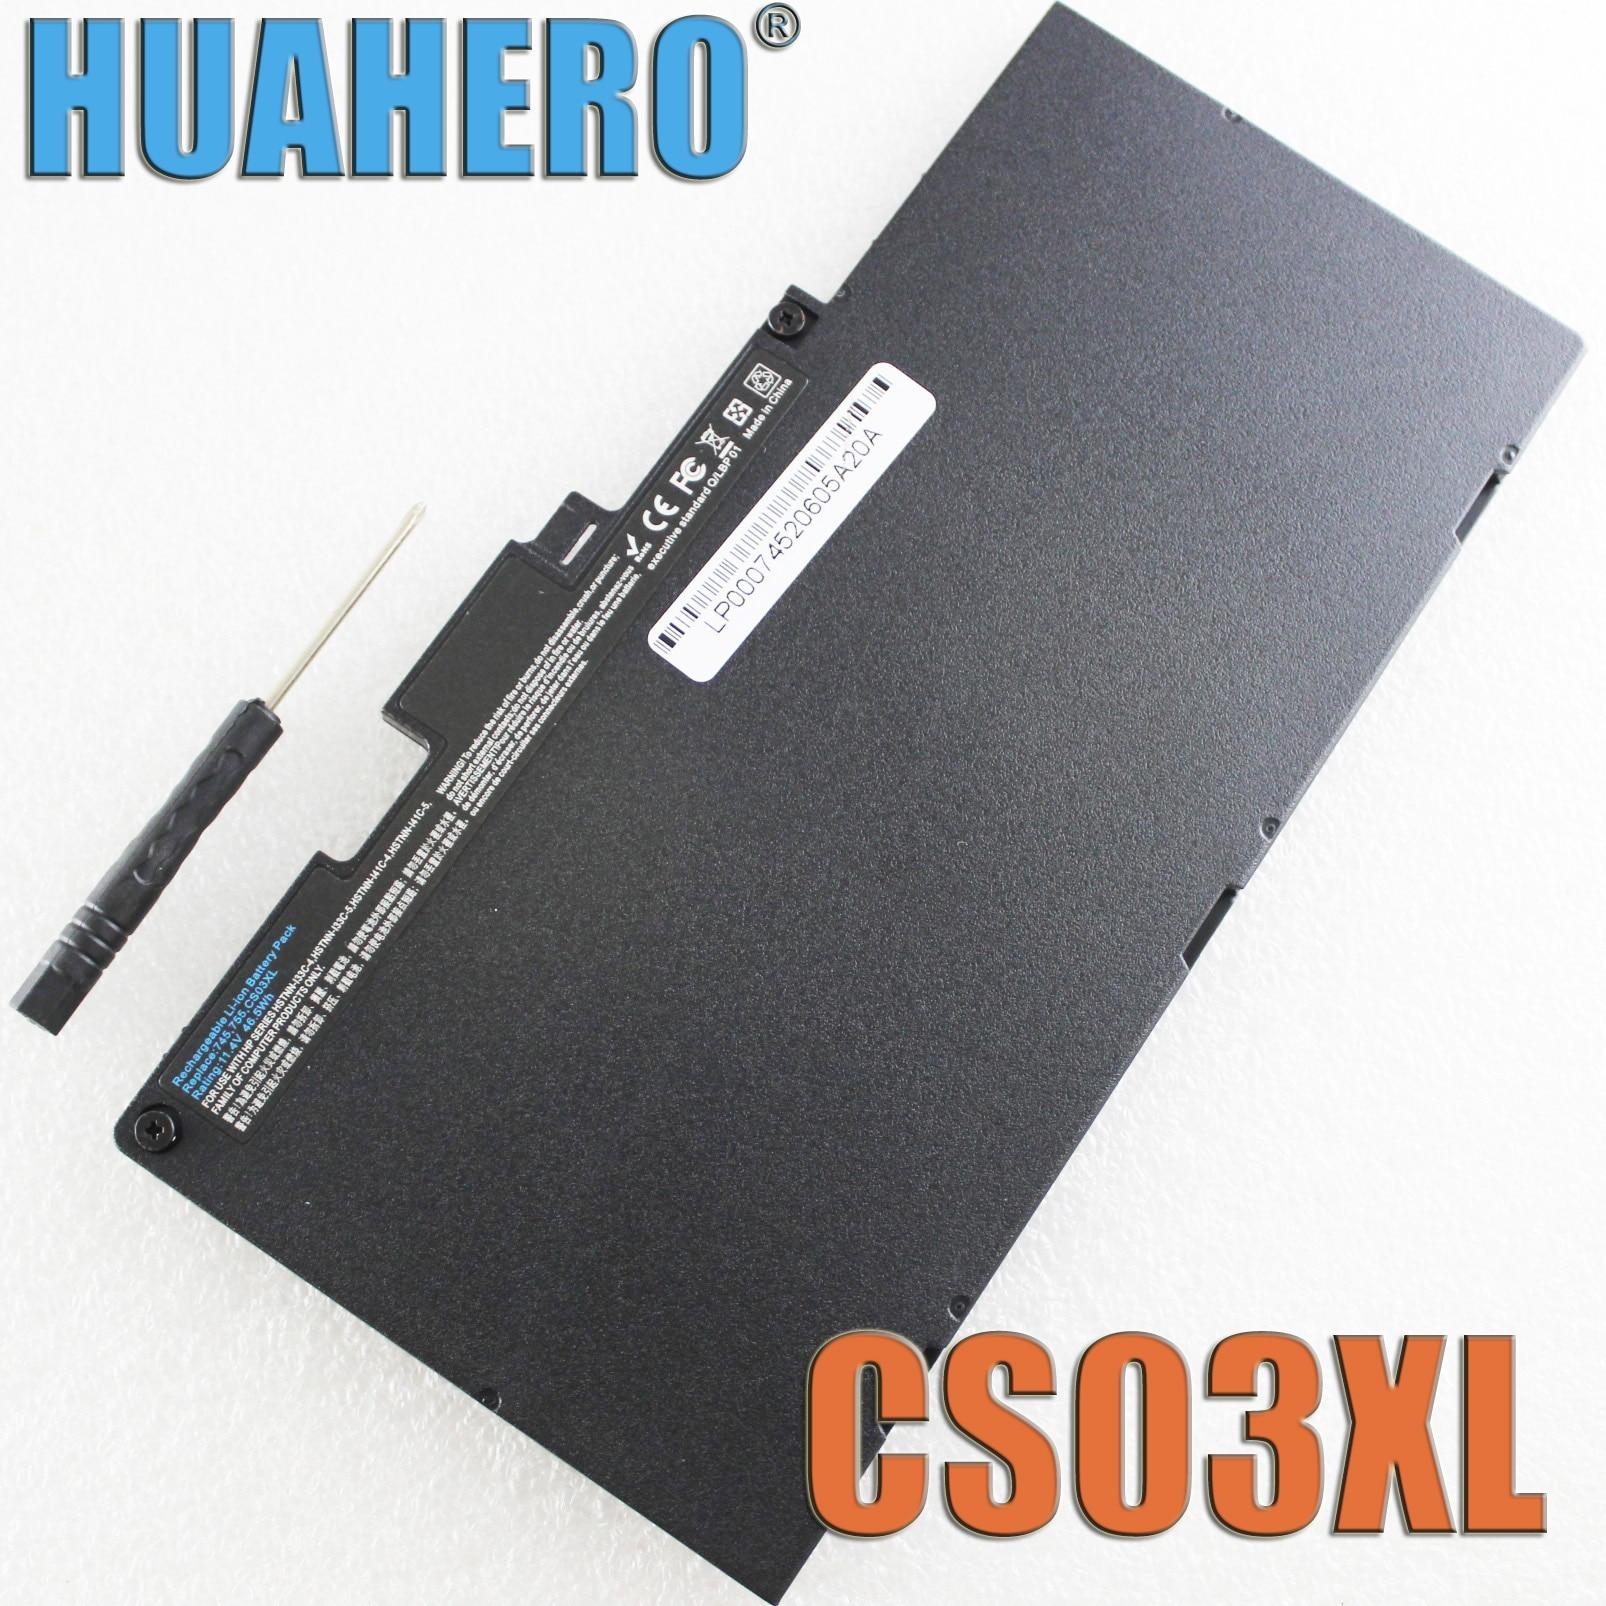 HUAHERO Battery CS03XL for HP ZBook 15u G3 G4 Elitebook 745 G4 840 G2 848 850 G3 G4 CS03 800231-141 800513-001 HSTNN-IB6Y UB6S kingsener cm03xl battery for hp elitebook 840 845 850 740 745 750 g1 g2 series hstnn db4q hstnn ib4r lb4r e7u24aa 716724 171